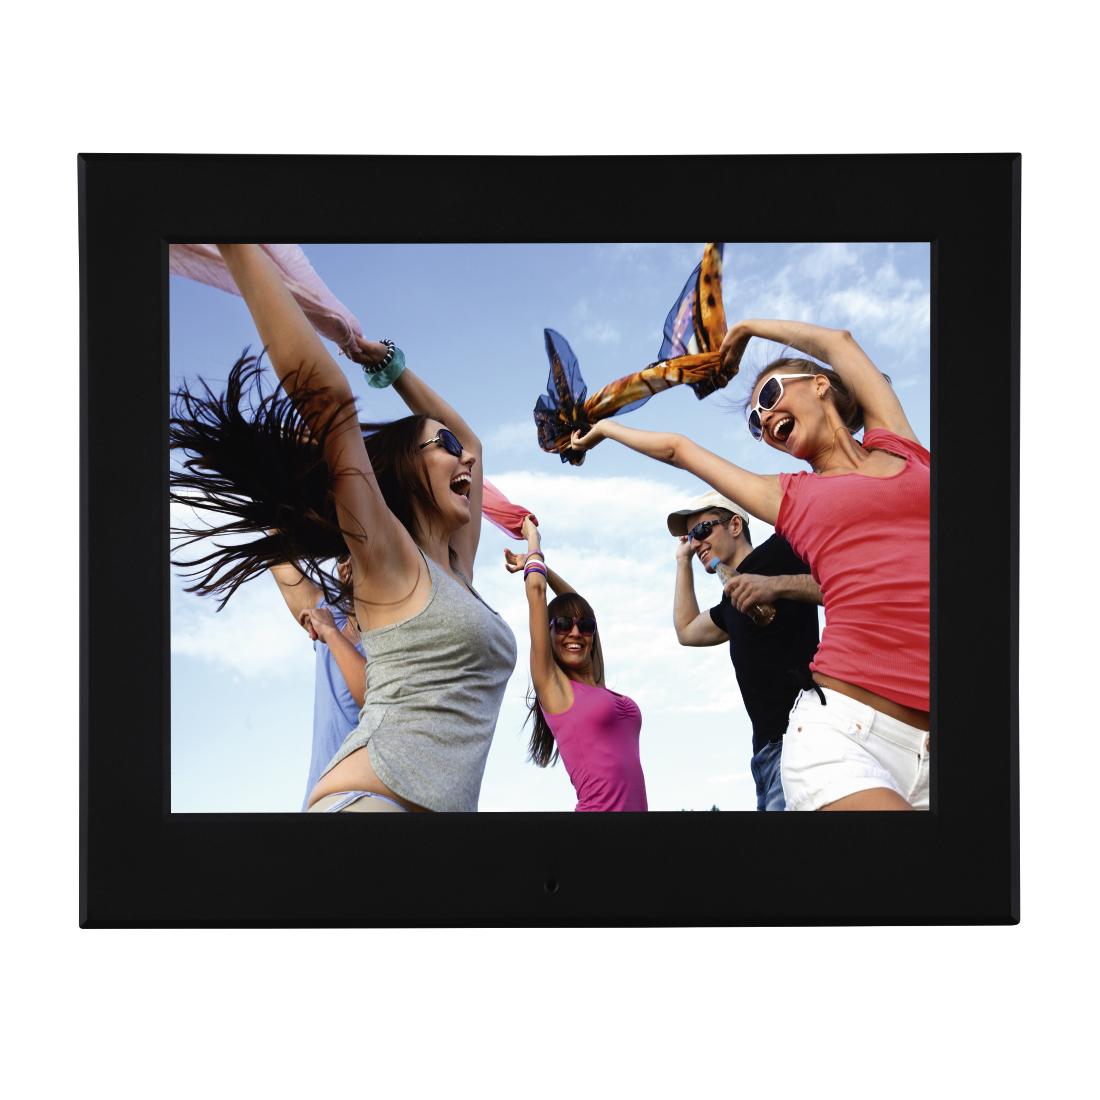 00095290 hama digitaler bilderrahmen 8slb 20 32 cm 8 0 slim 1024 x 768 pixel. Black Bedroom Furniture Sets. Home Design Ideas